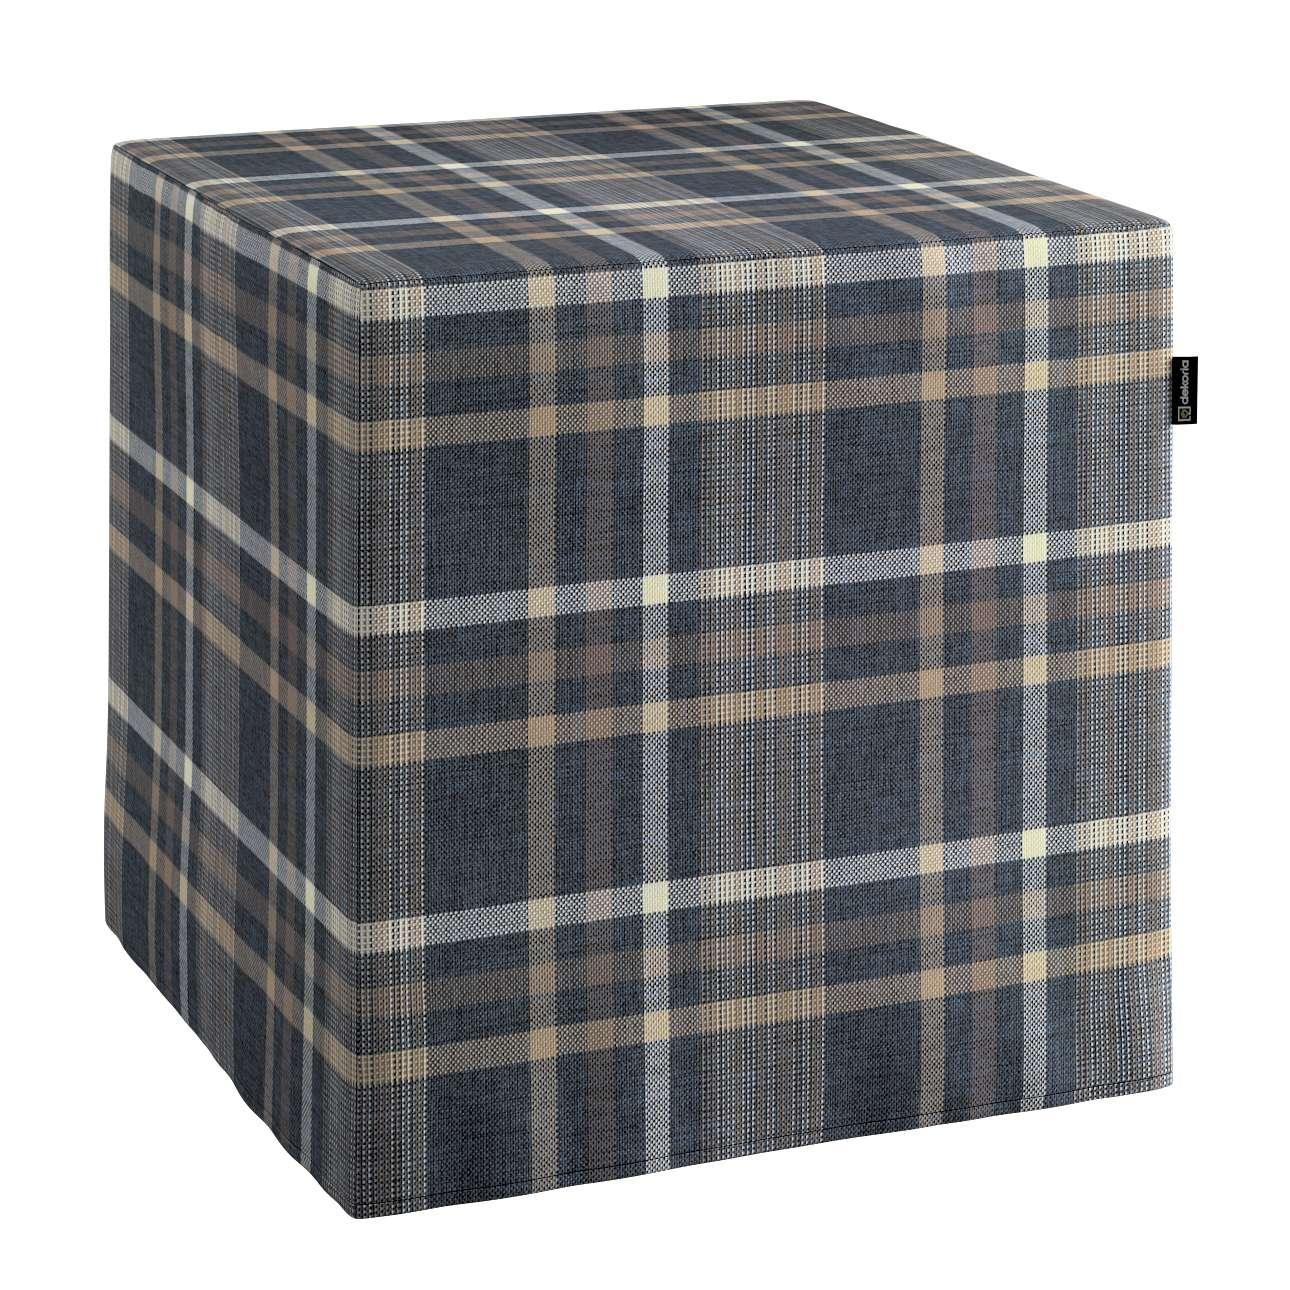 Pufa kostka w kolekcji Edinburgh, tkanina: 703-16